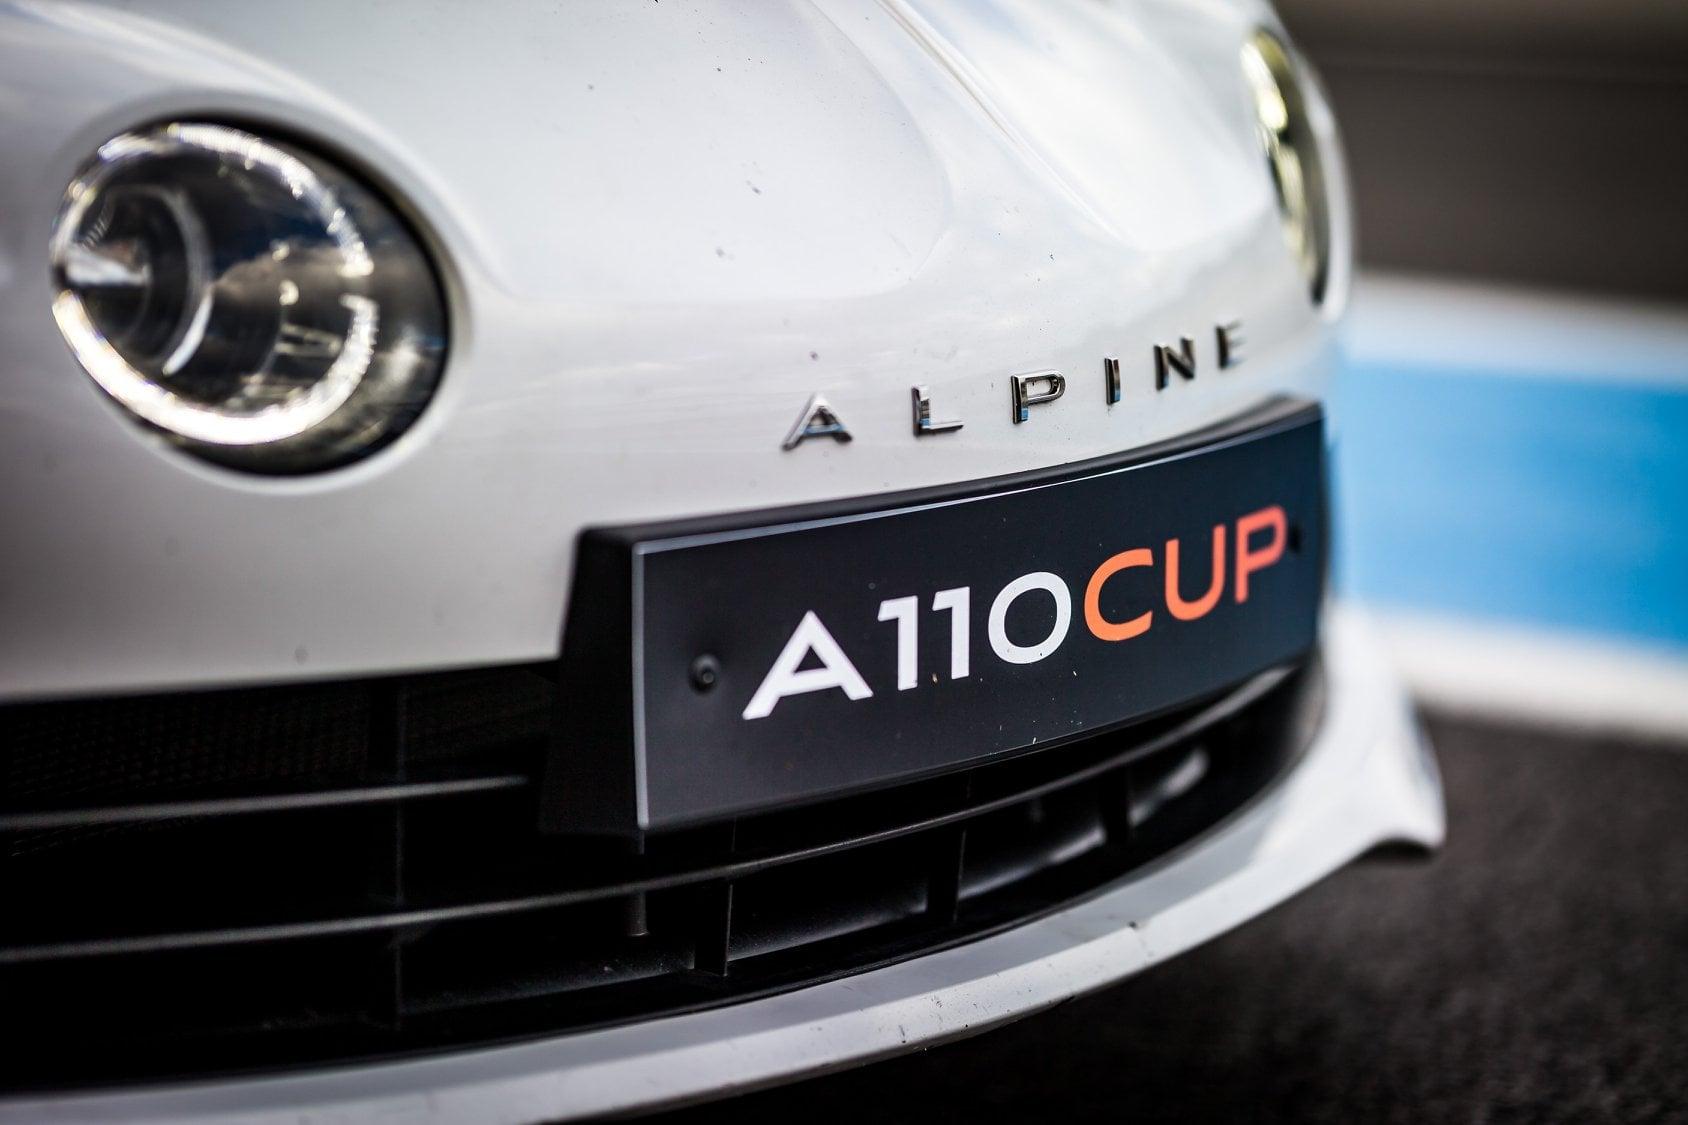 Alpine Elf Europa Cup 2020 Castellet 2020 A110 27 | Alpine Elf Europa Cup 2020: Jean-Baptiste Mela et Laurent Hurgon dominent au Castellet